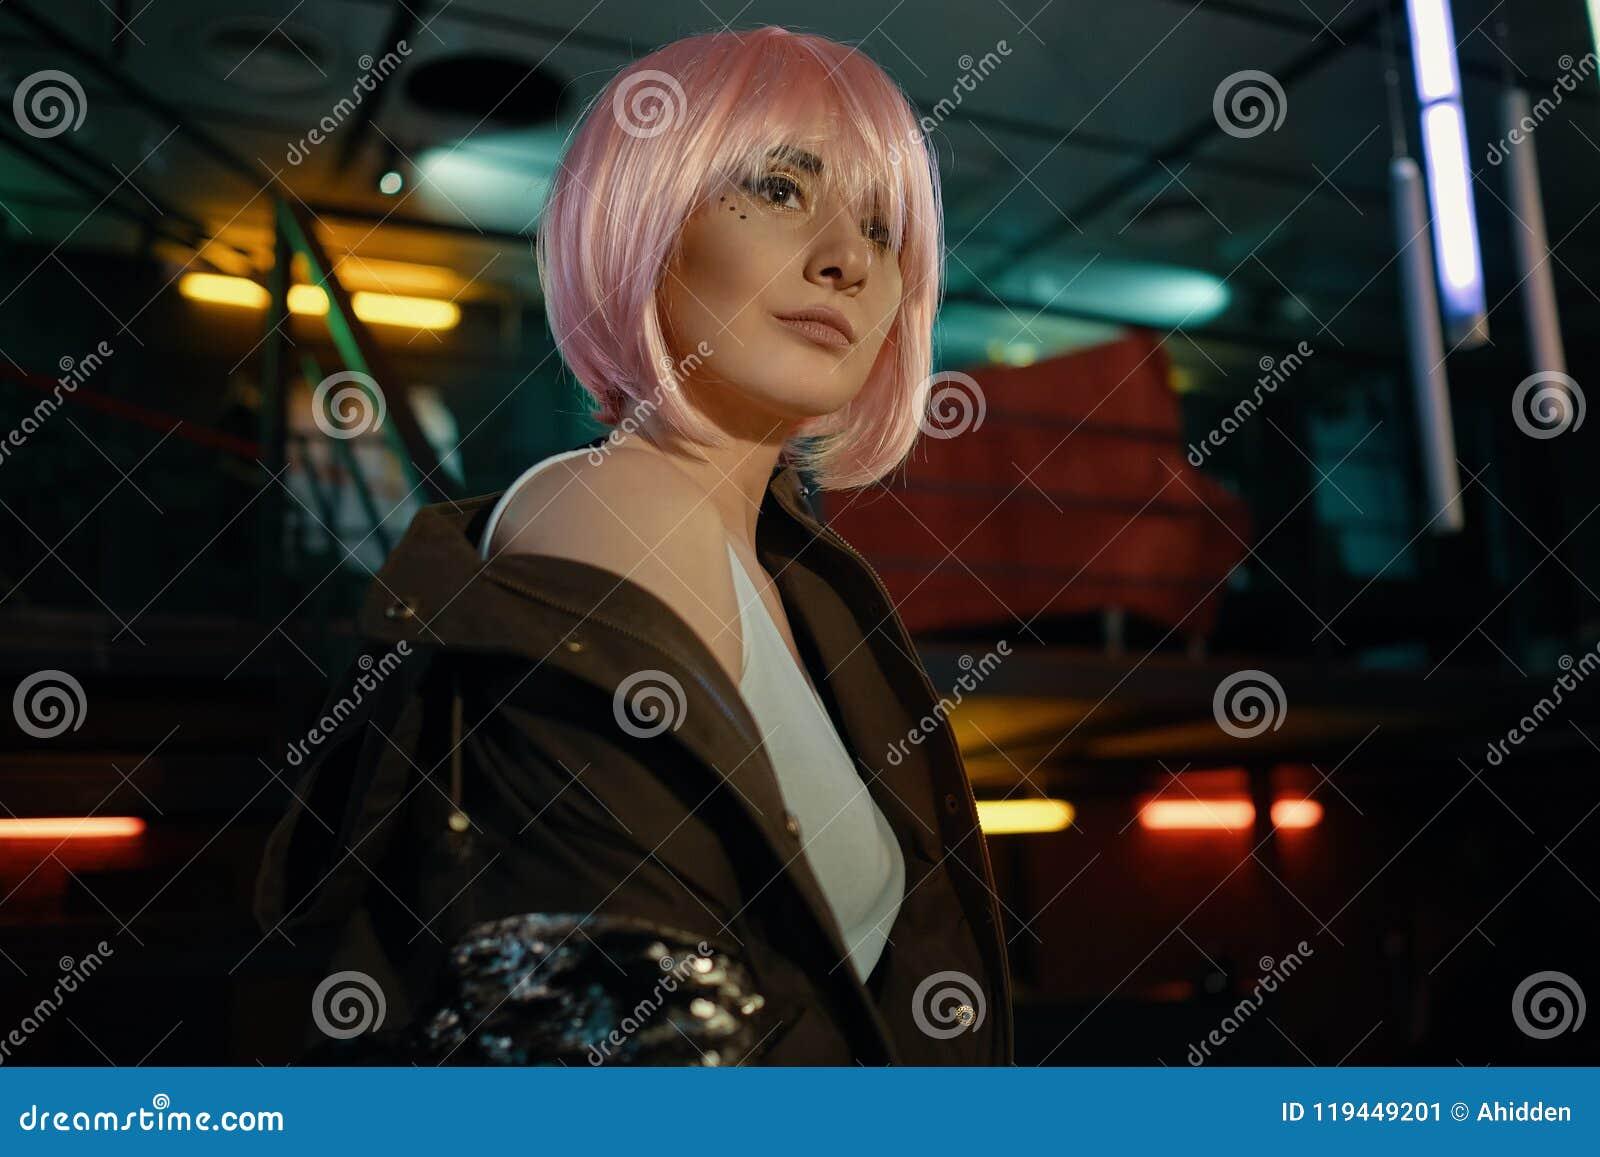 Girl and Nightclub life stock image  Image of design - 119449201